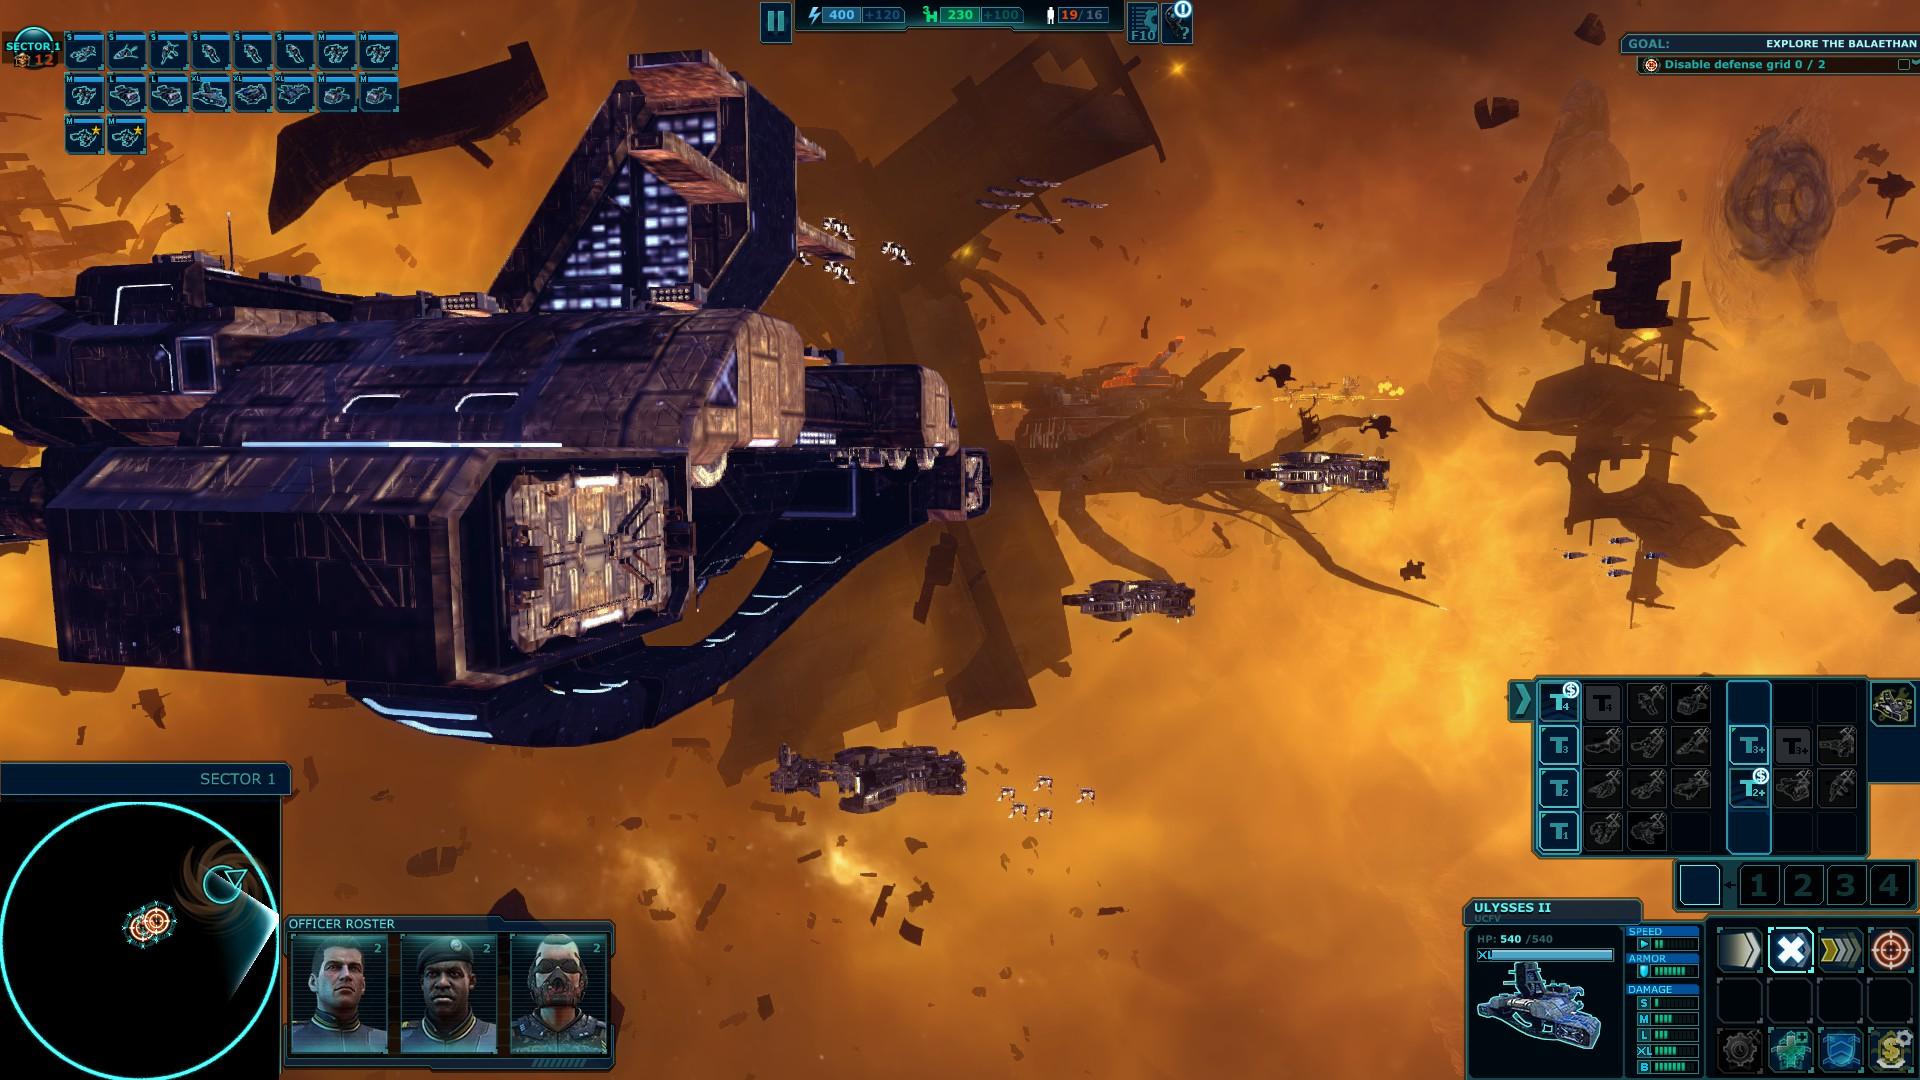 spacecraft computer game - photo #37